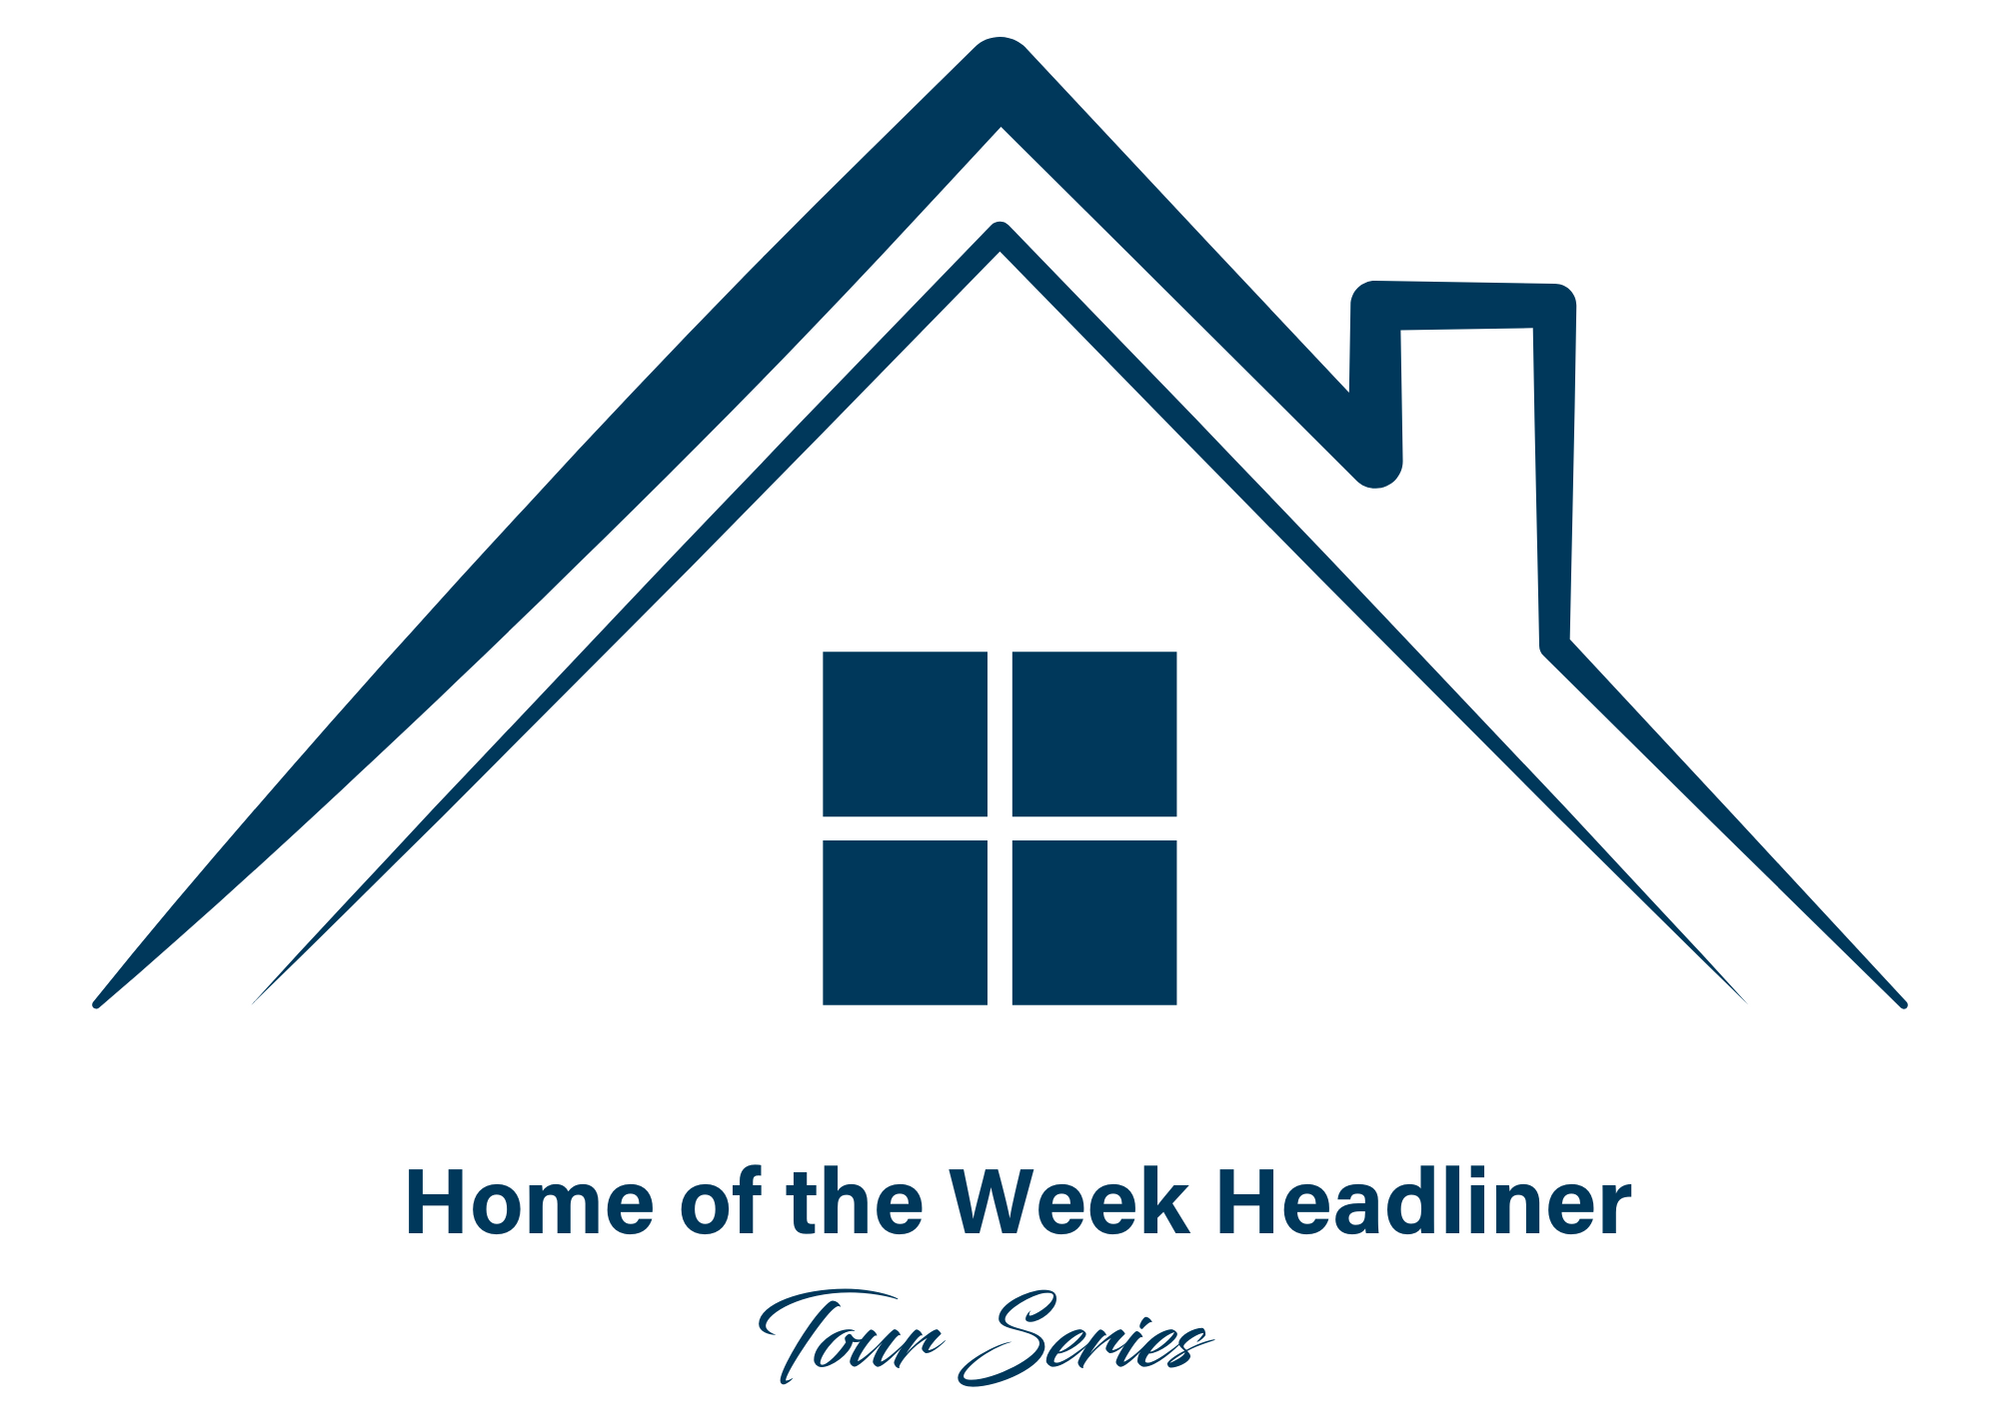 Home of the Week Headliner tour series